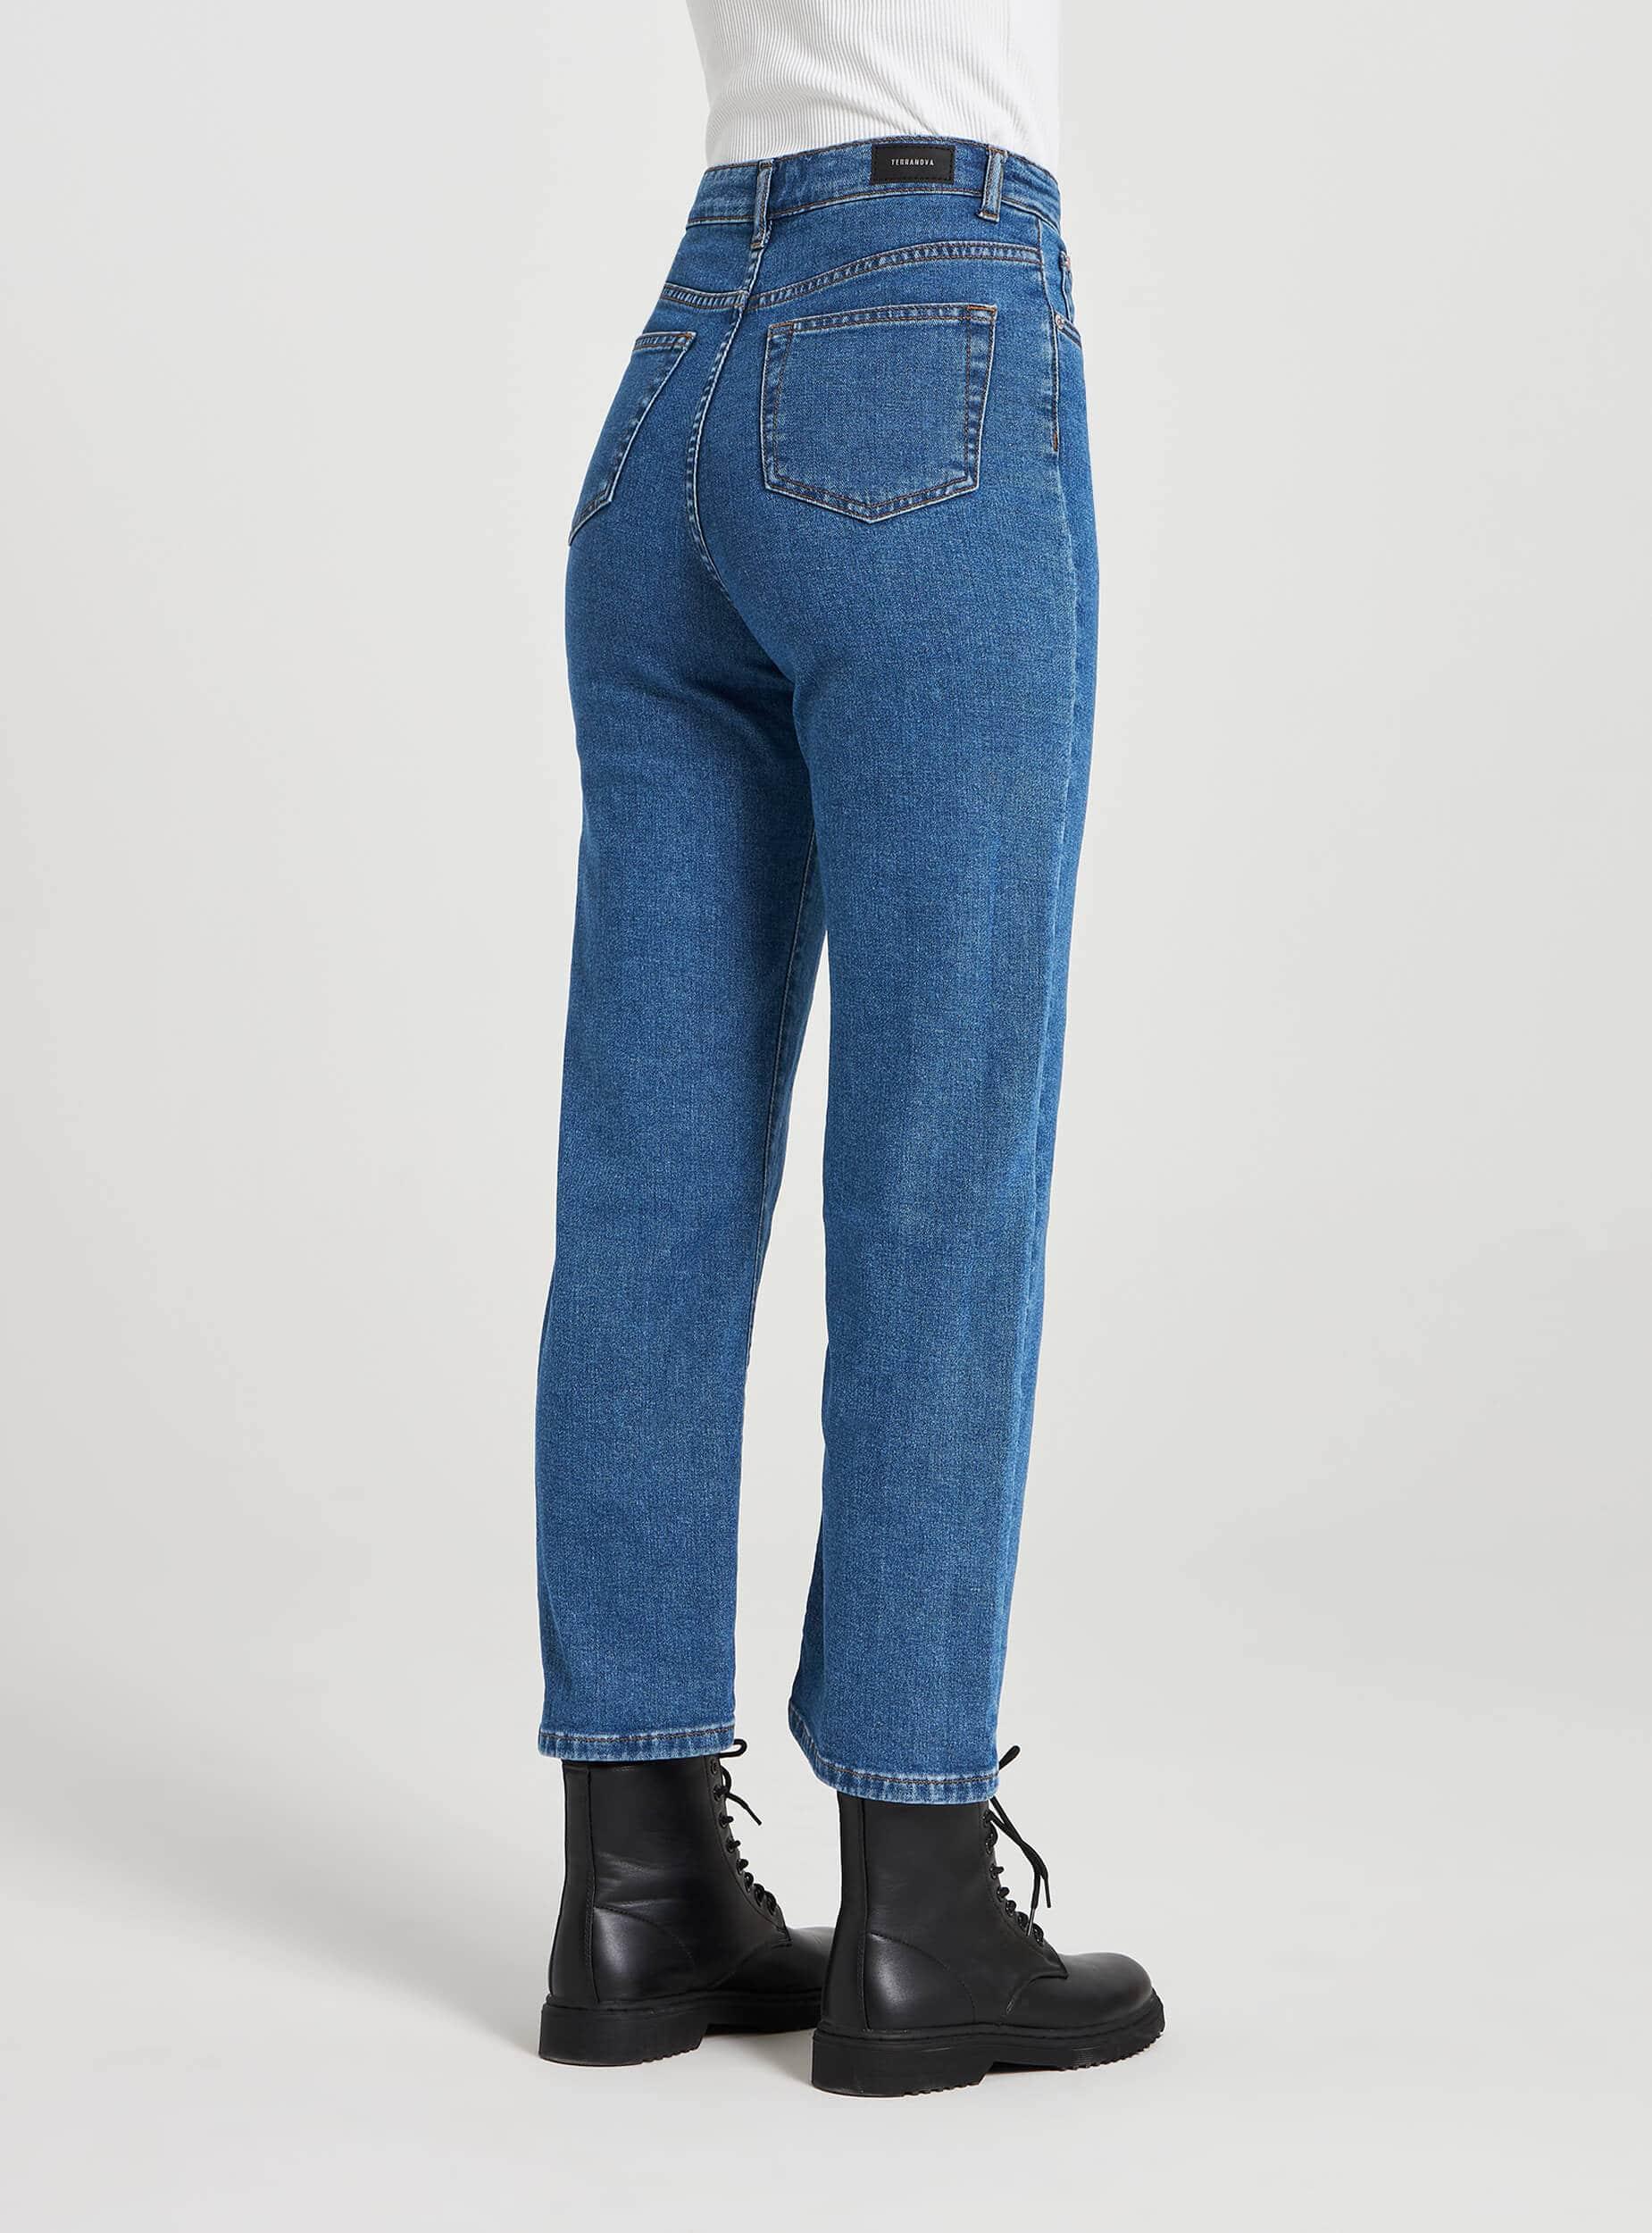 Jean Coupe Droite Taille Haute Bleu Denim Moyen Achetez En Ligne Terranova